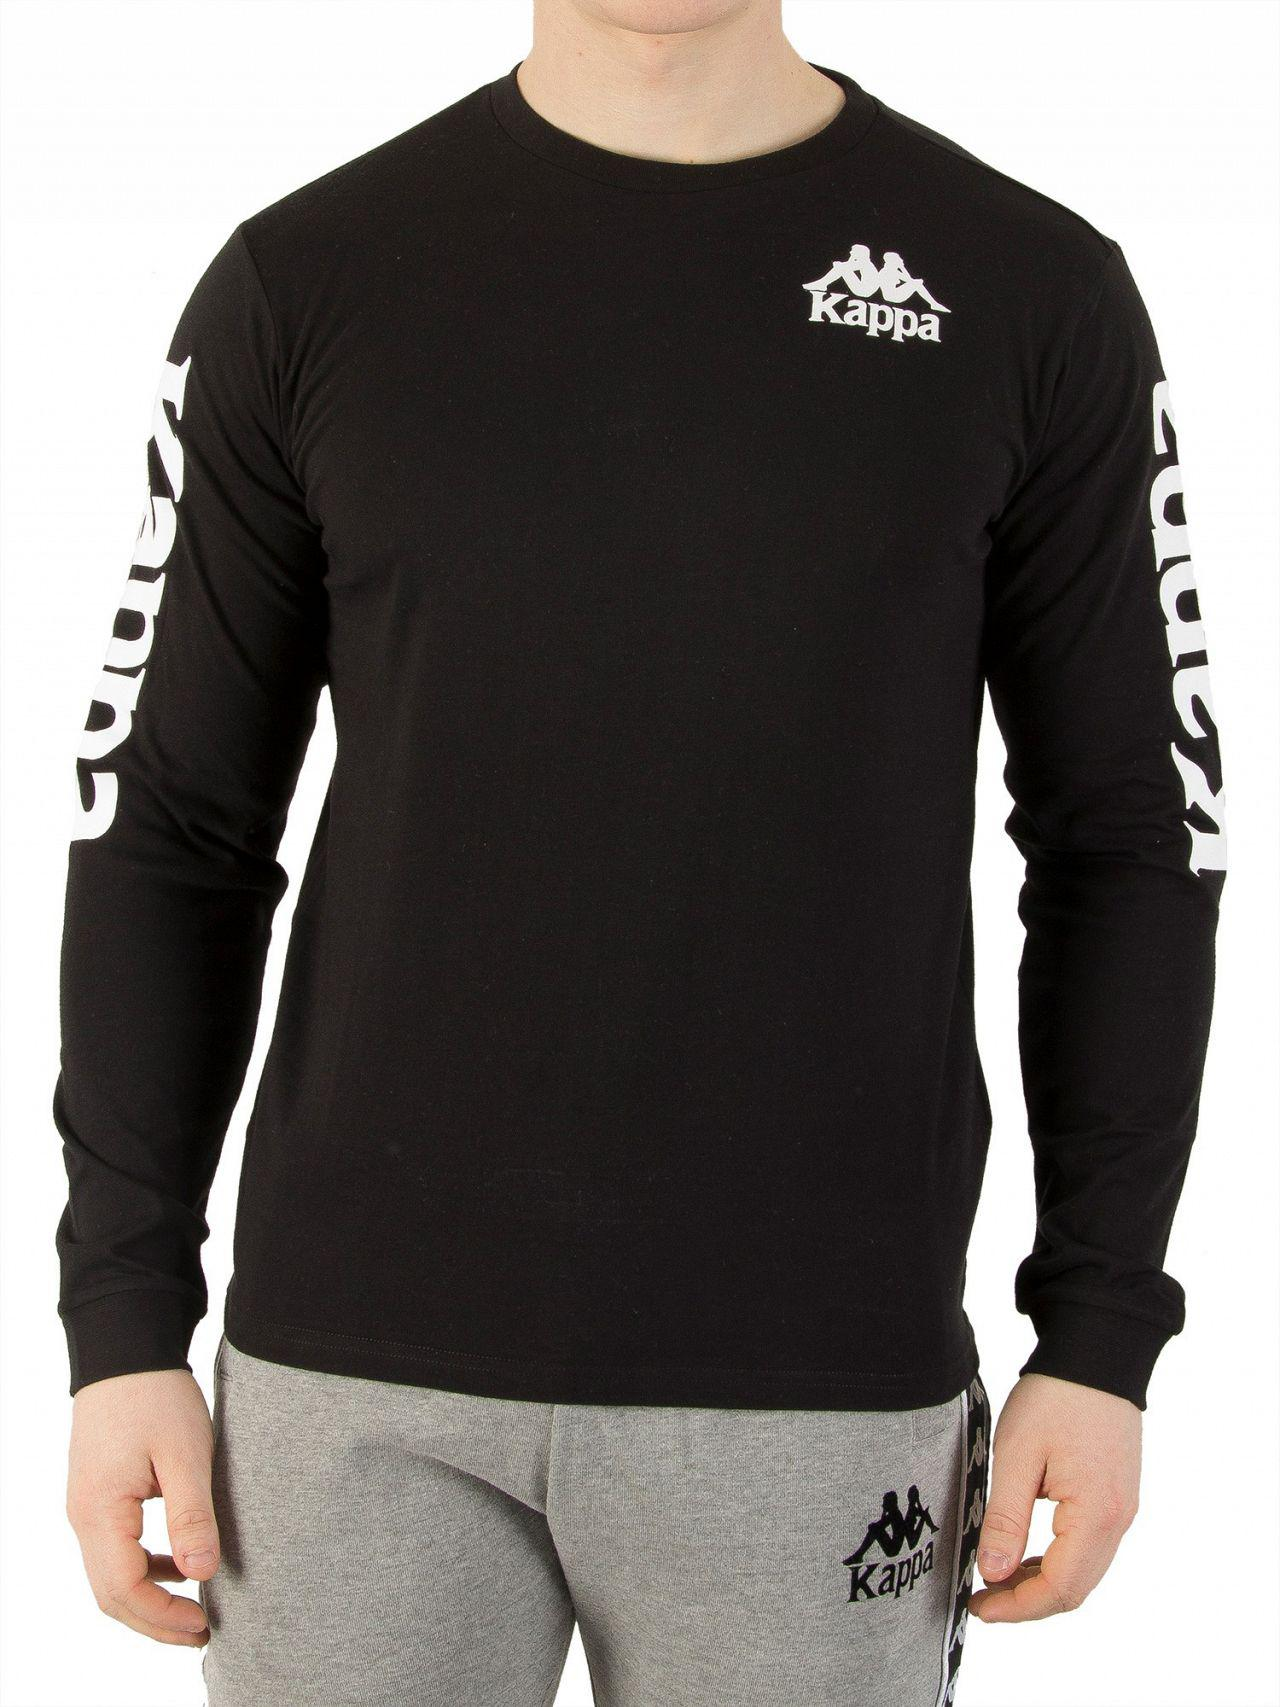 158f16ba Lyst - Kappa T-shirt in Black for Men